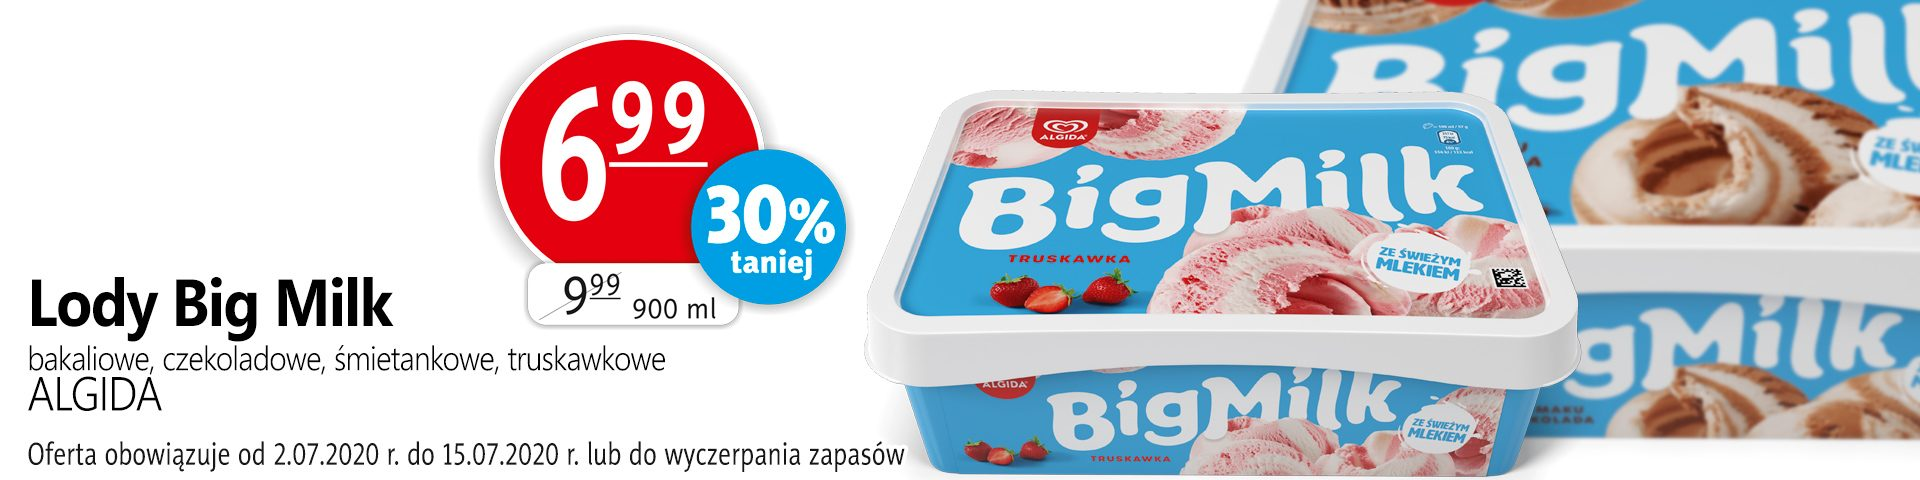 billbord-2-15.07_big_milk